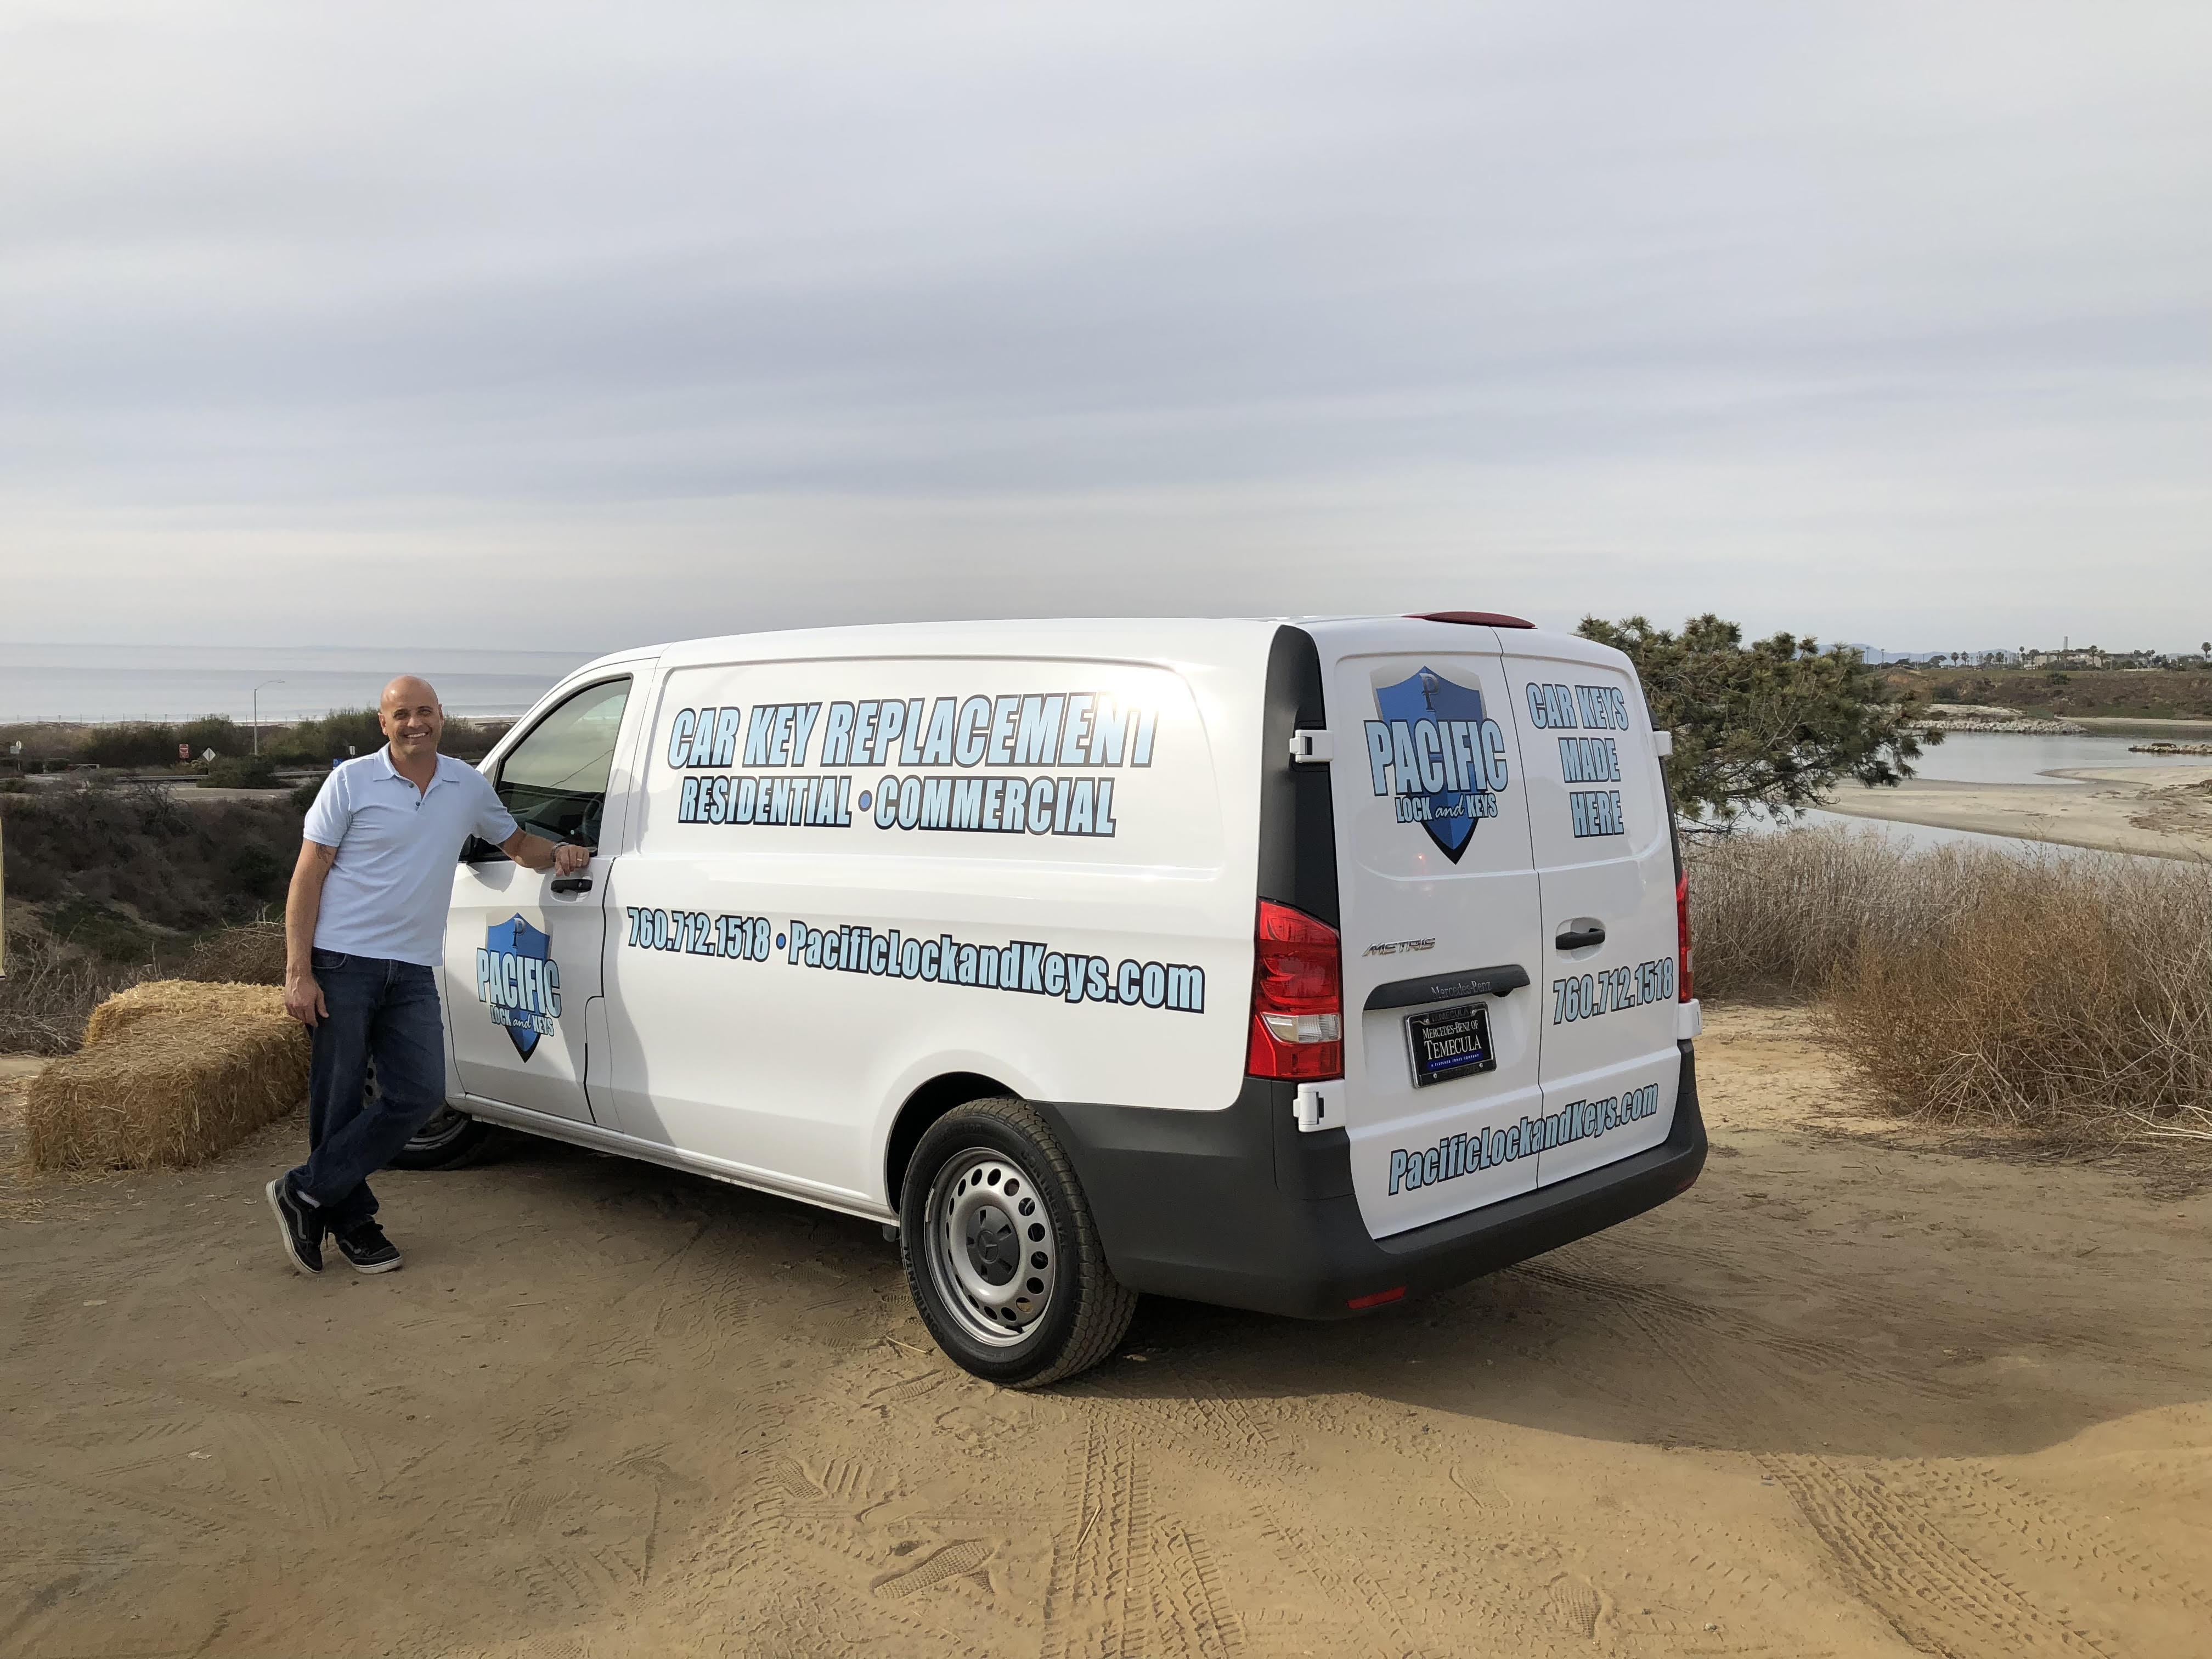 Gallery San Diego Locksmith Lock & Key Services In Oceanside